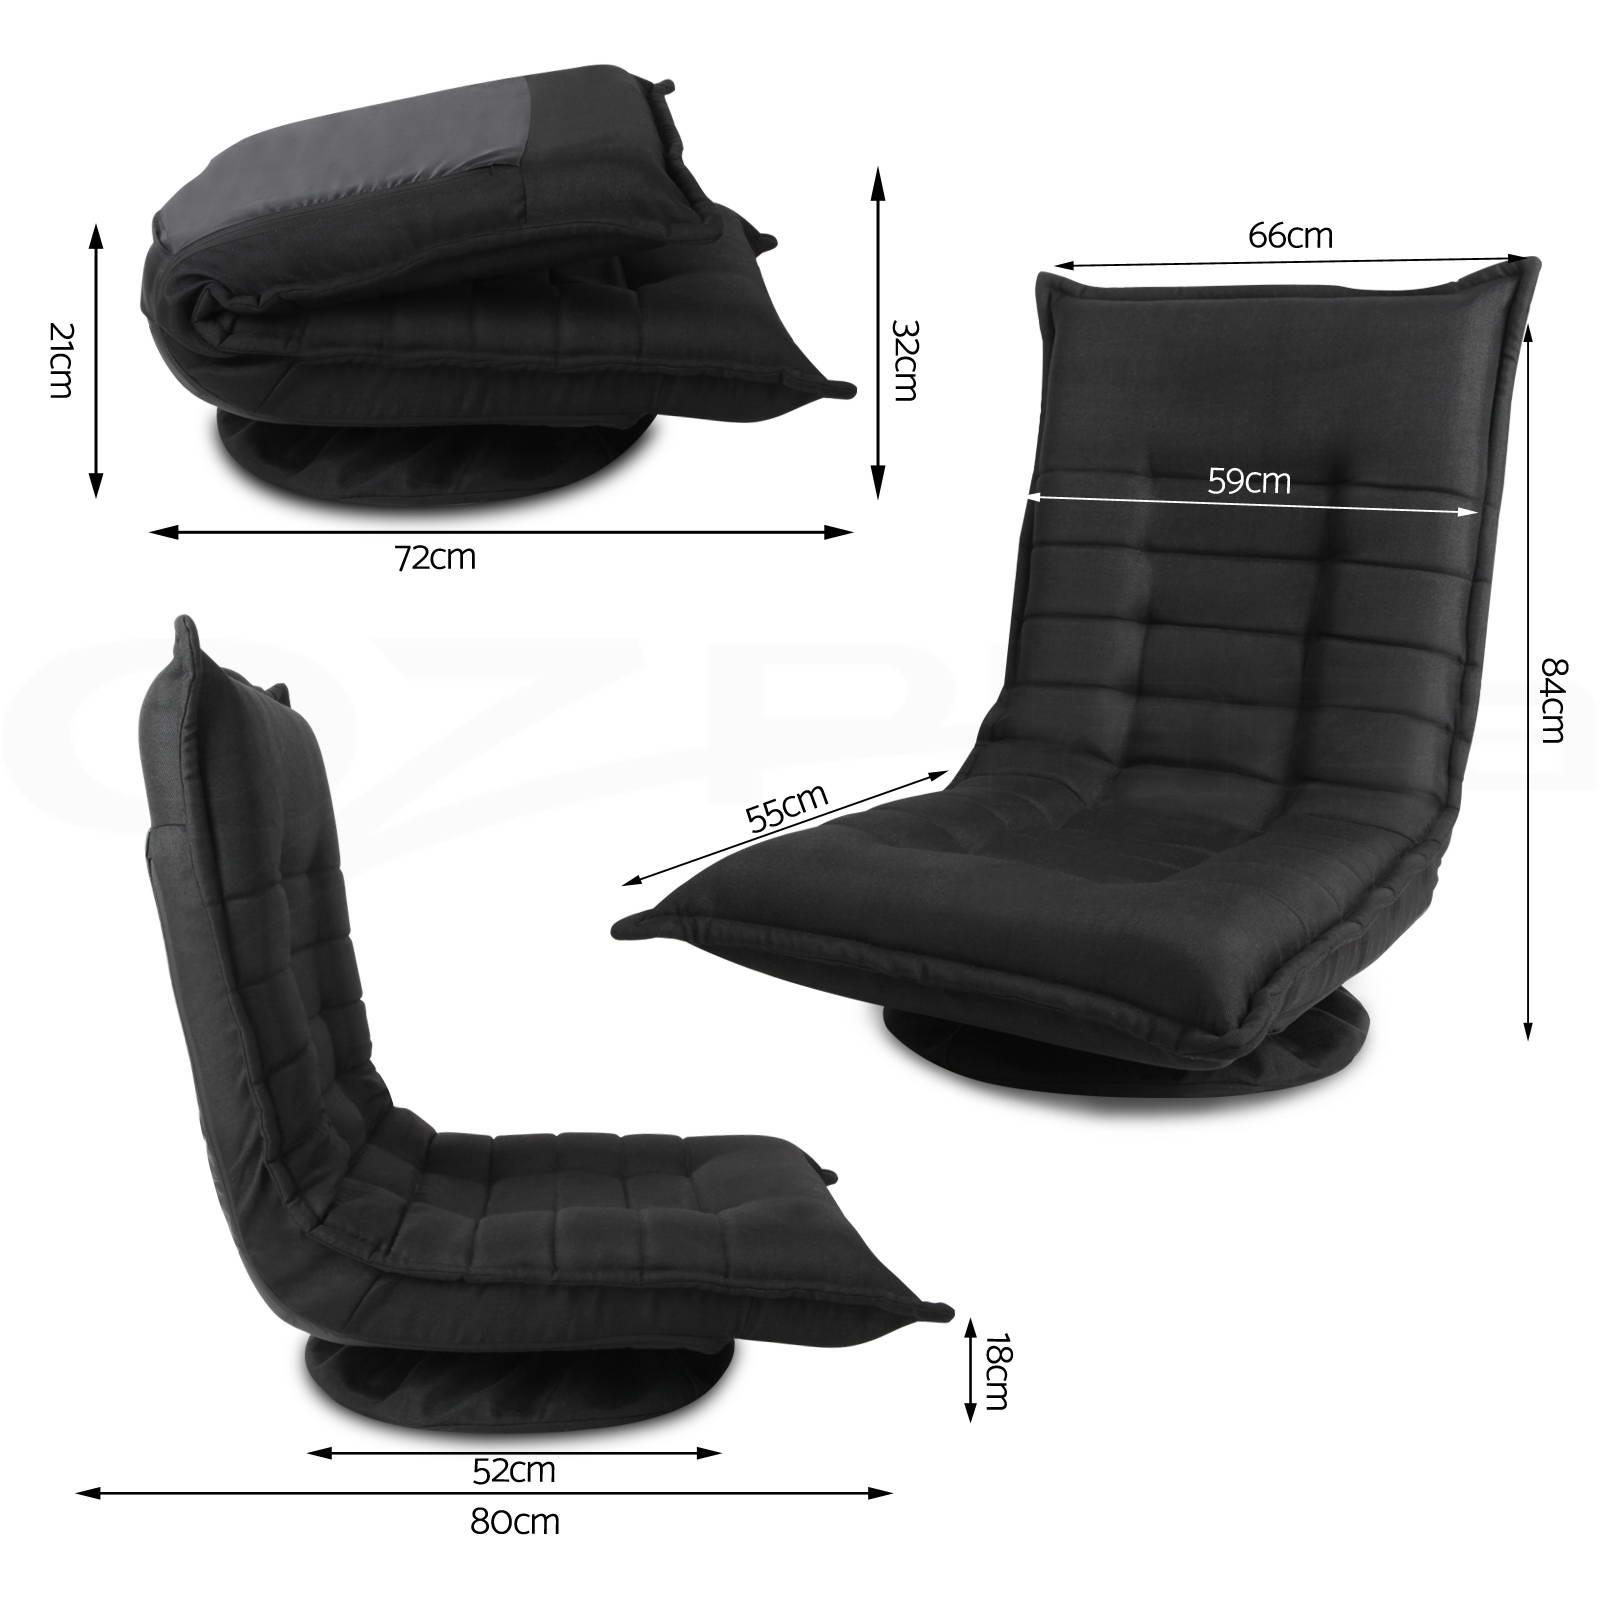 Floor Sofa Lounge Tatami Chair Swivel Seat Foldable Chaise